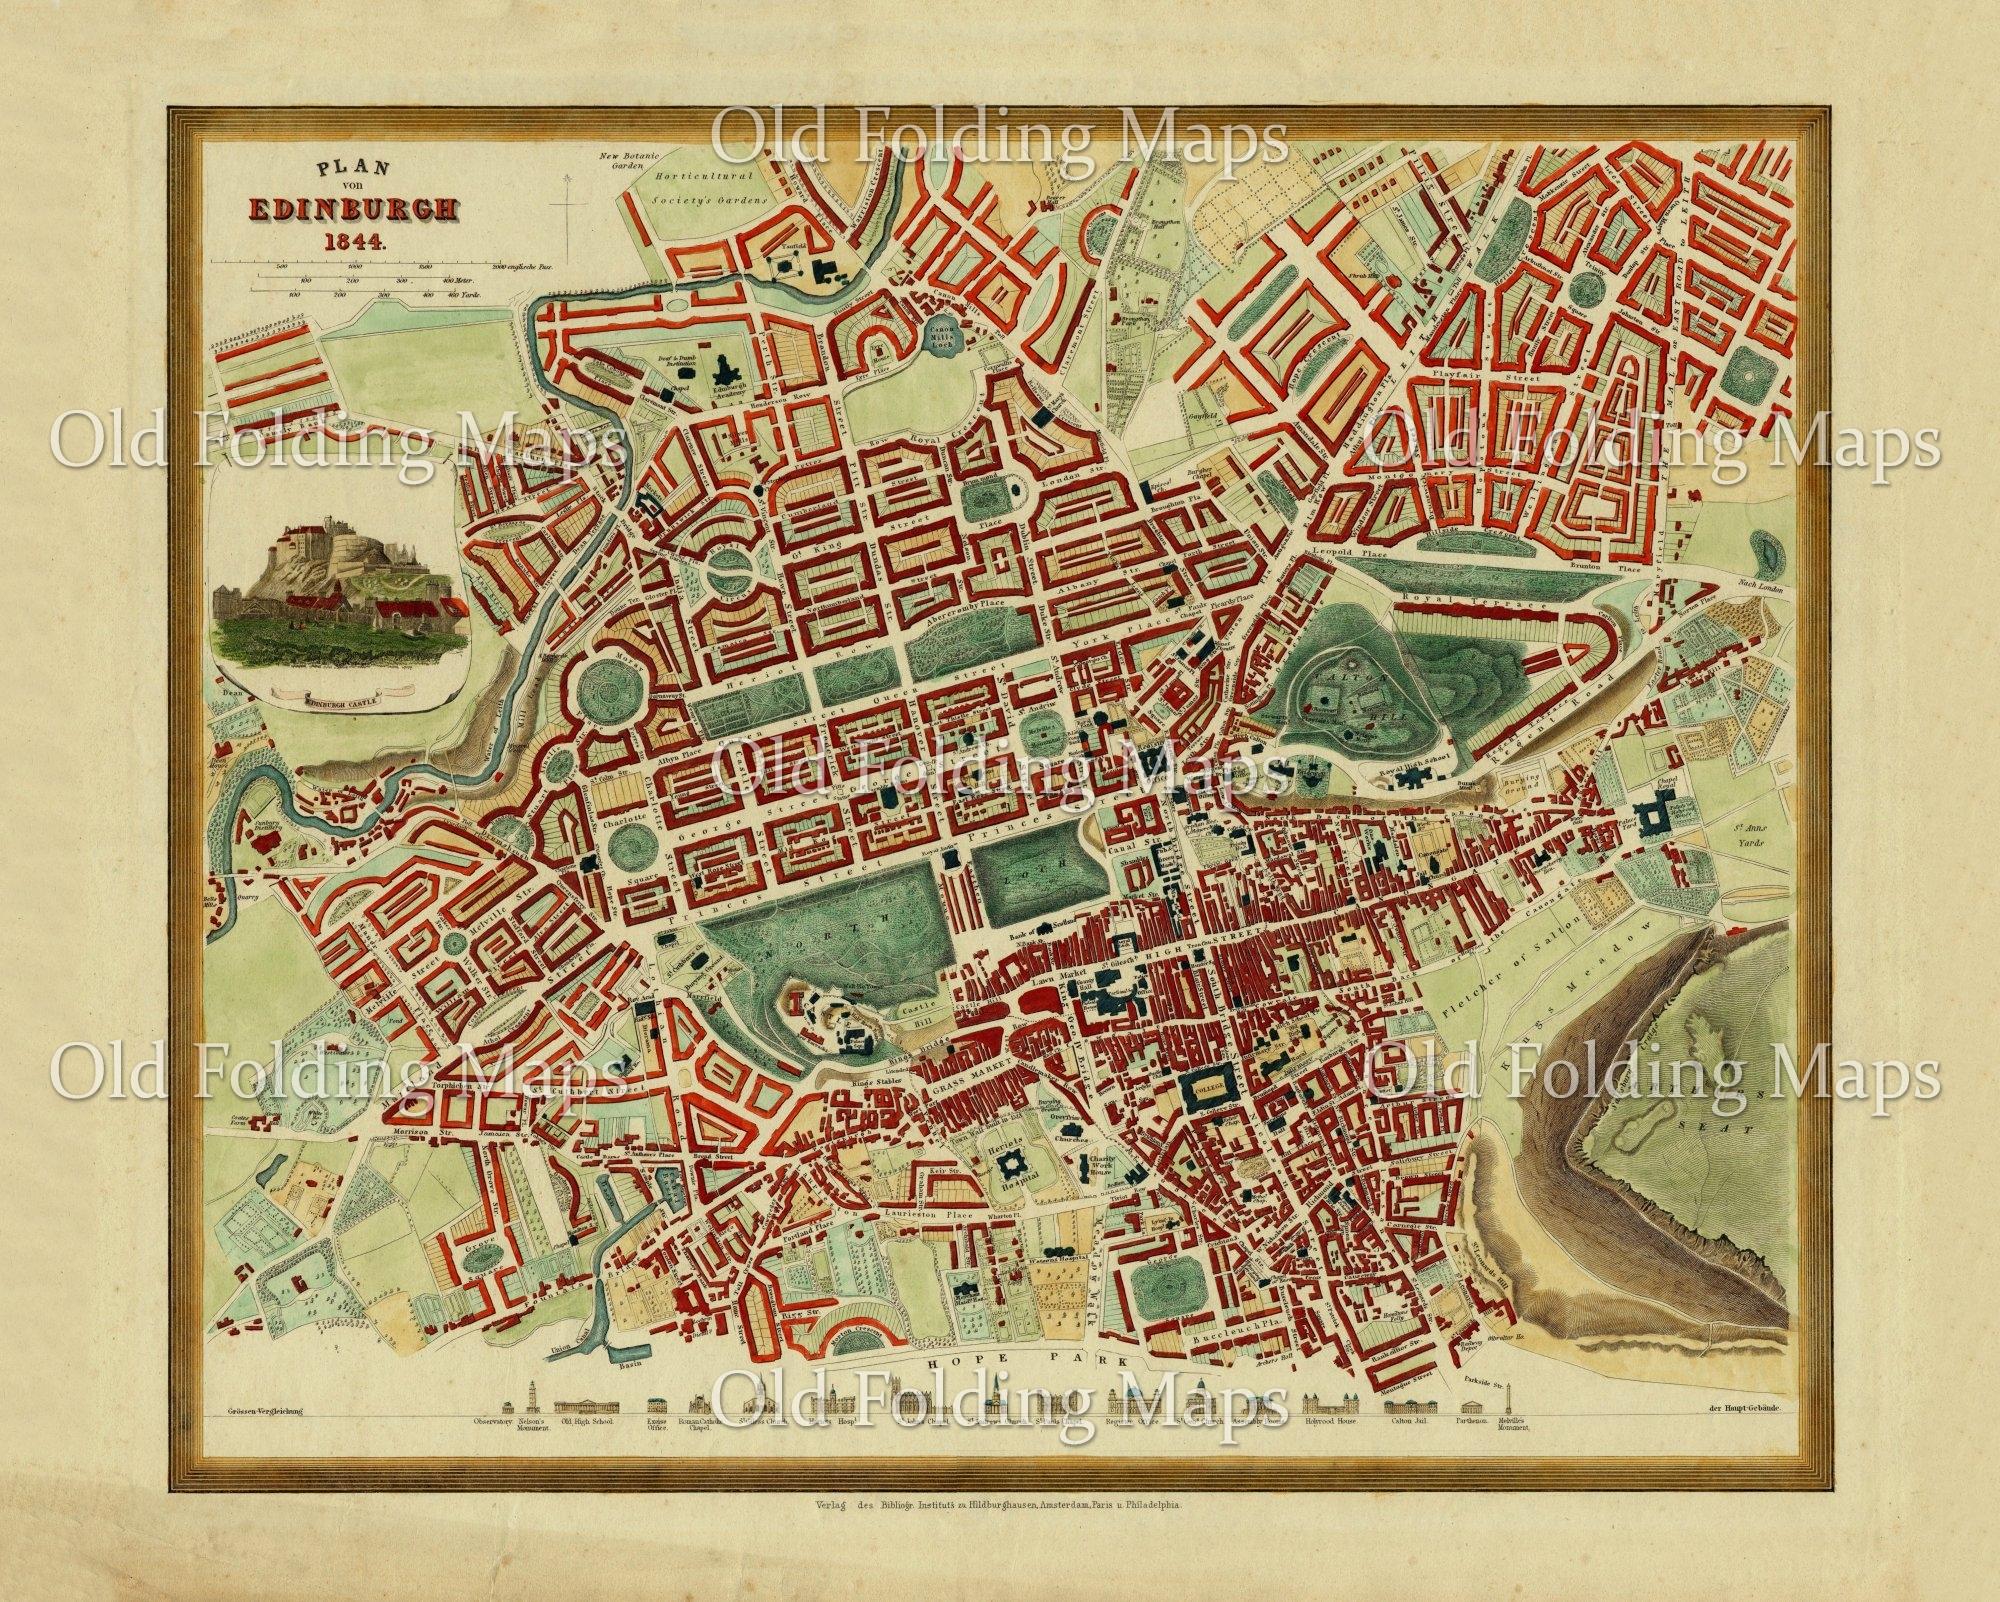 Old Map of the city of Edinburgh, Scotland circa 1872